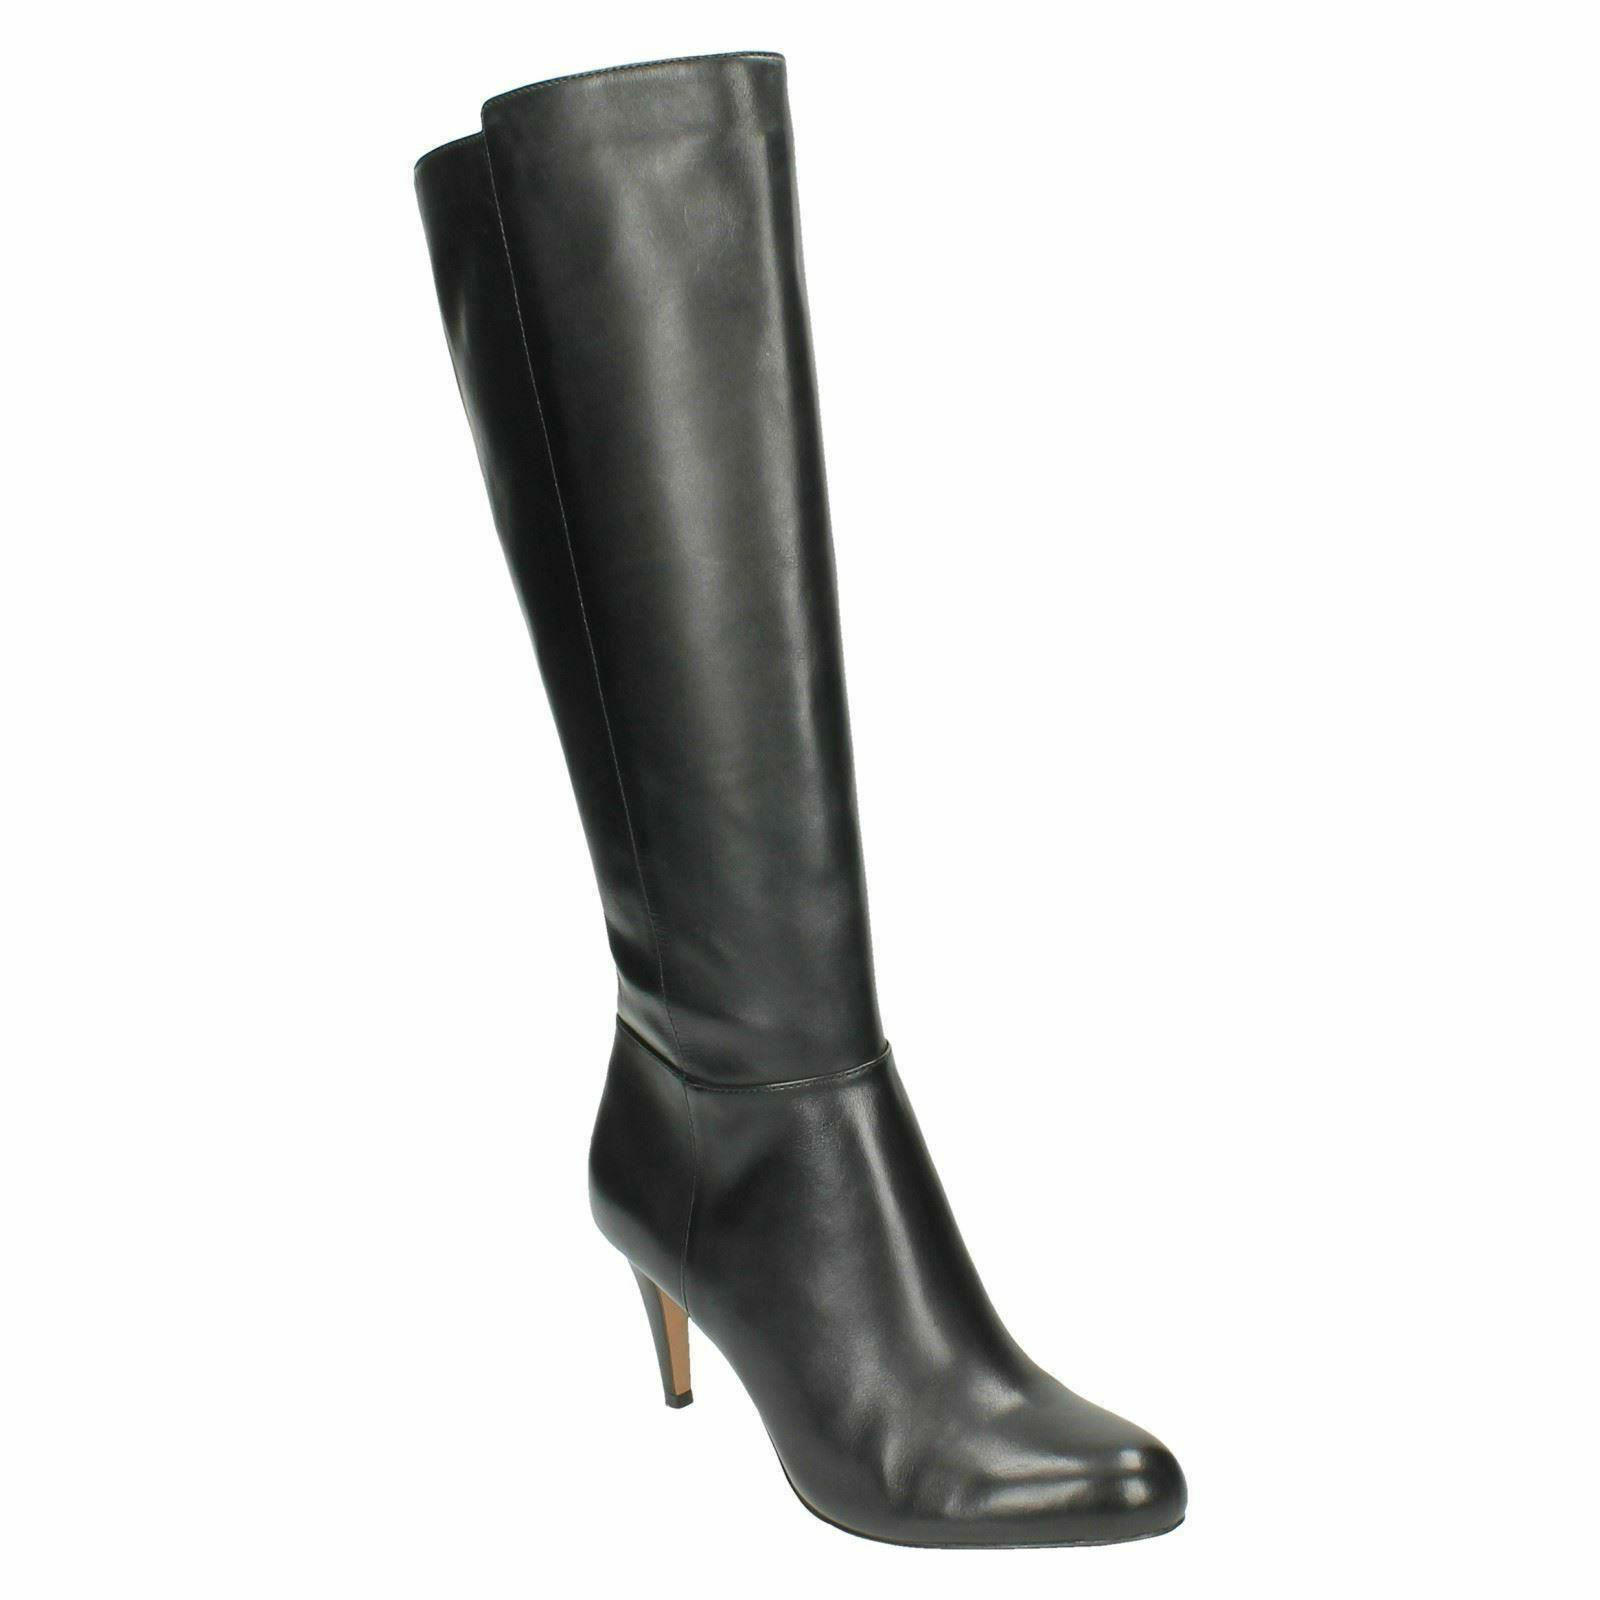 Carlita Encanto Señora Clarks Tacón Stiletto Cremallera Botas De Cuero Negro